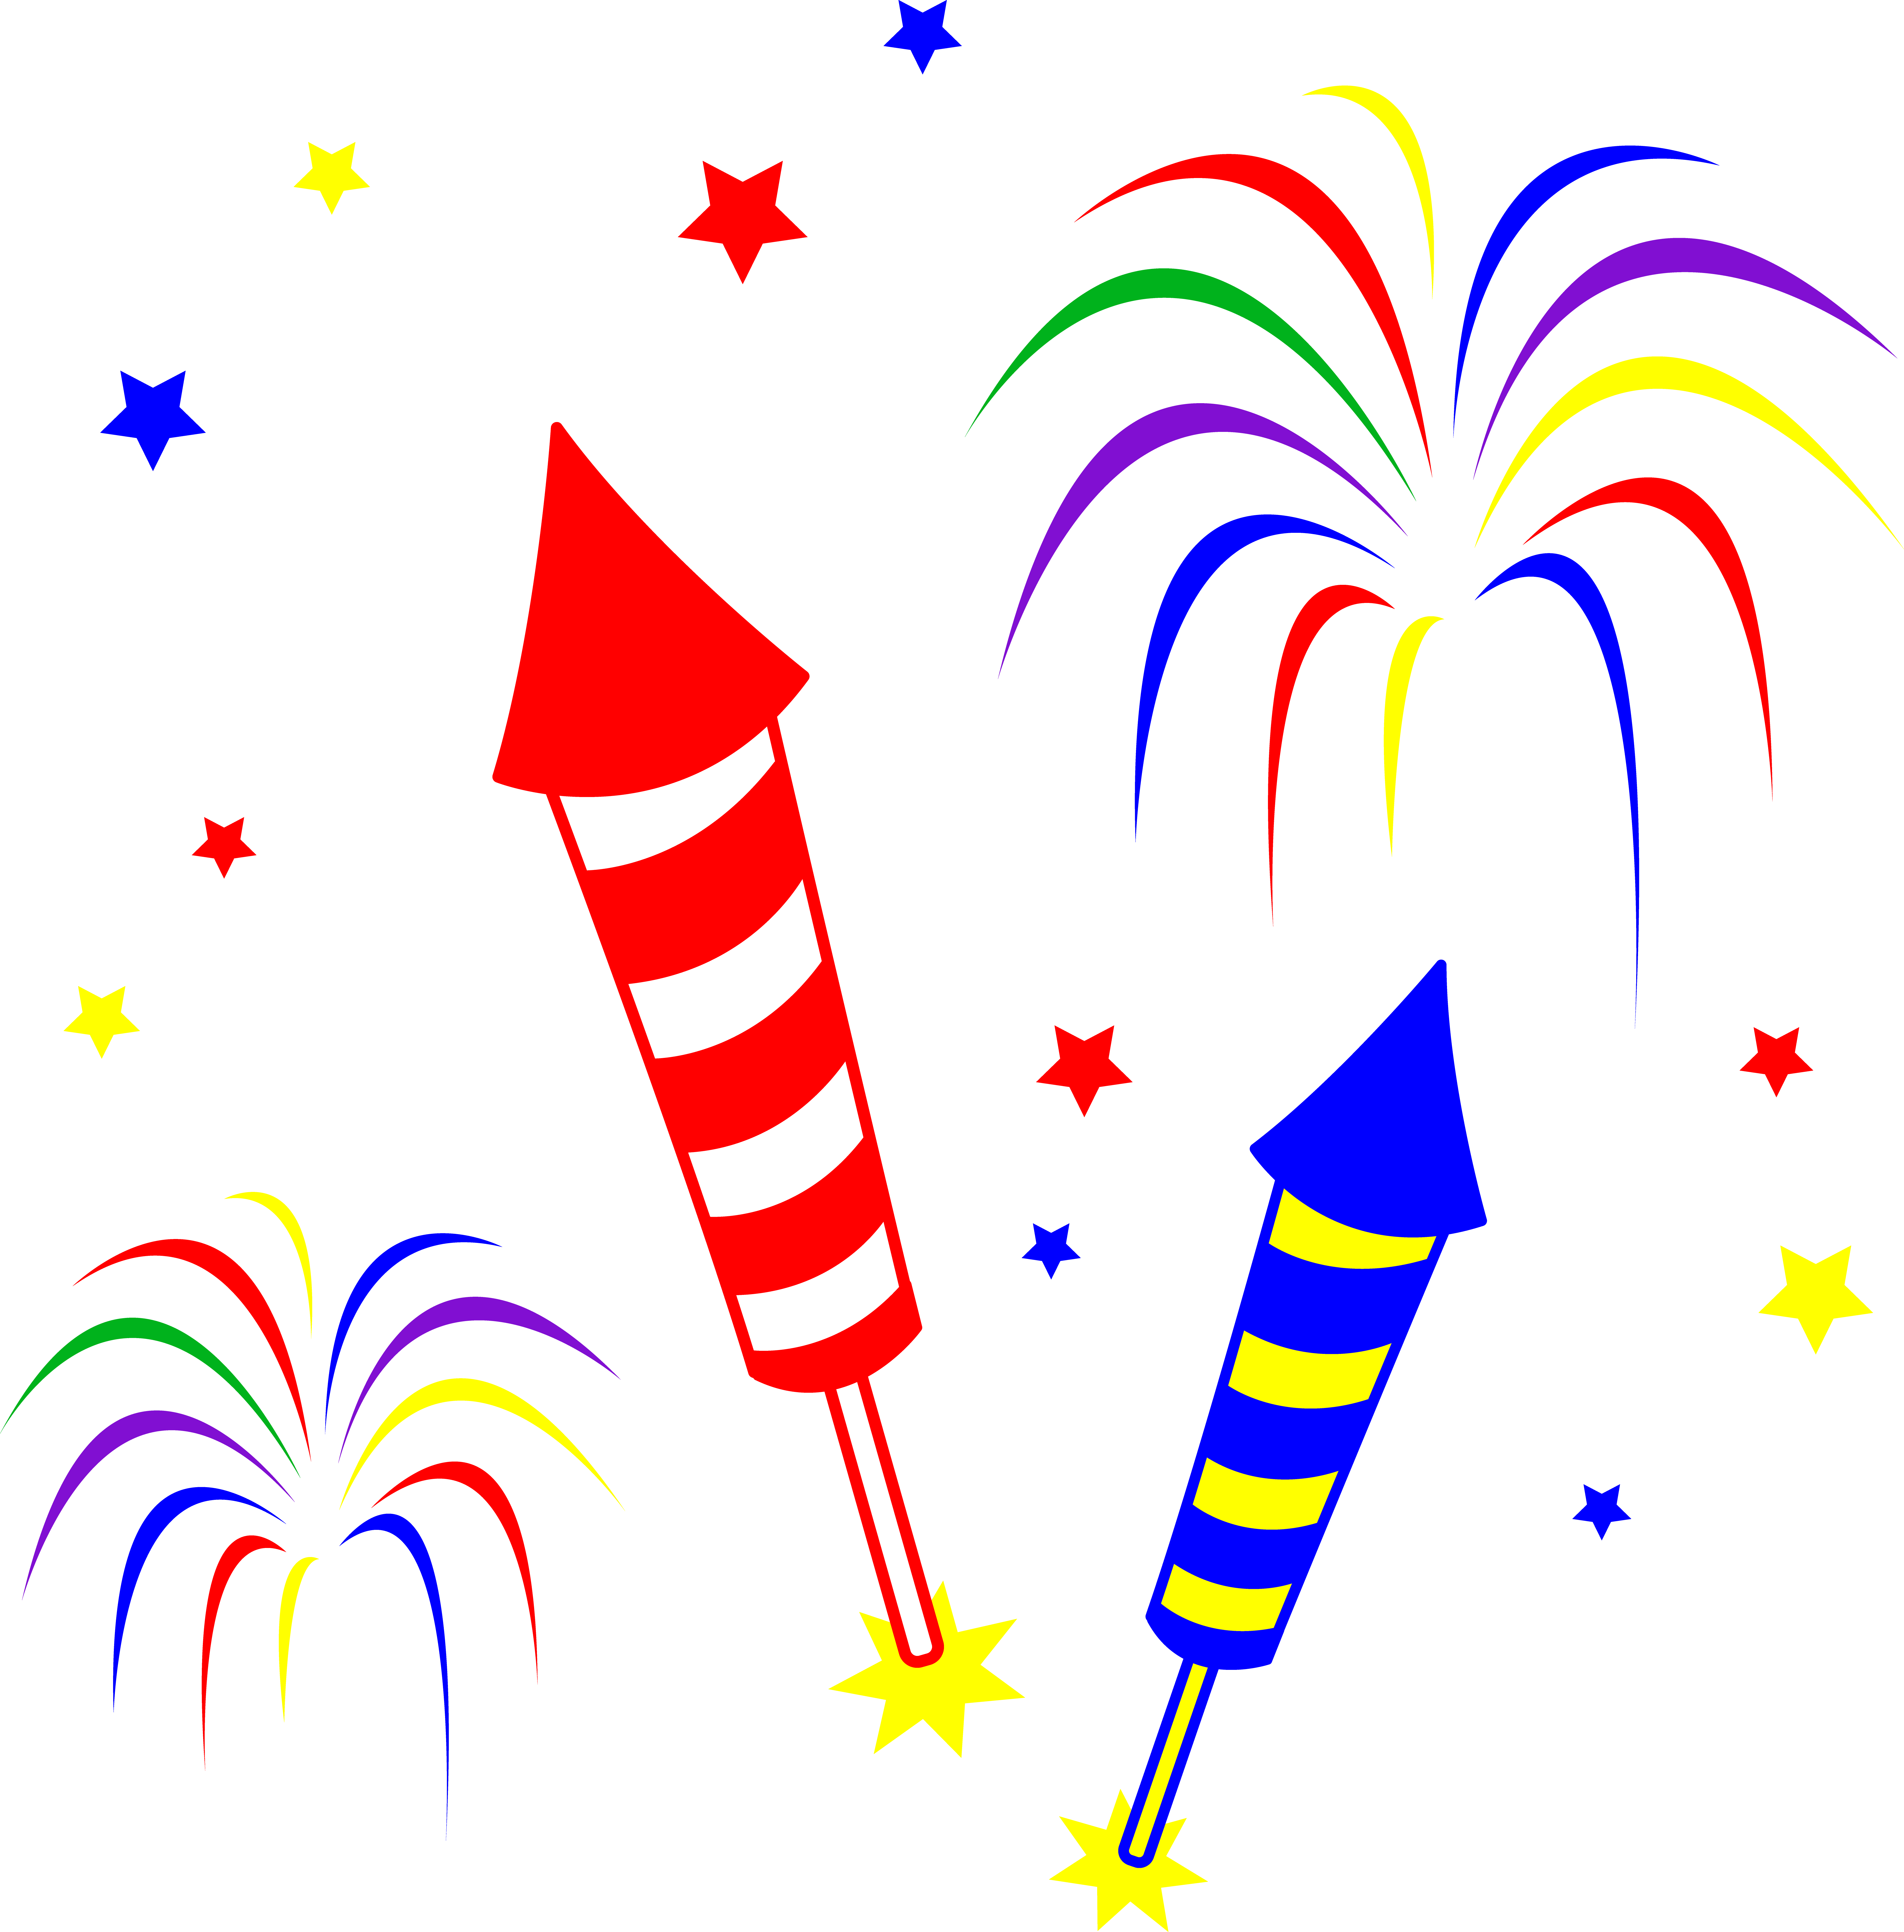 Clipart fireworks motion, Clipart fireworks motion.